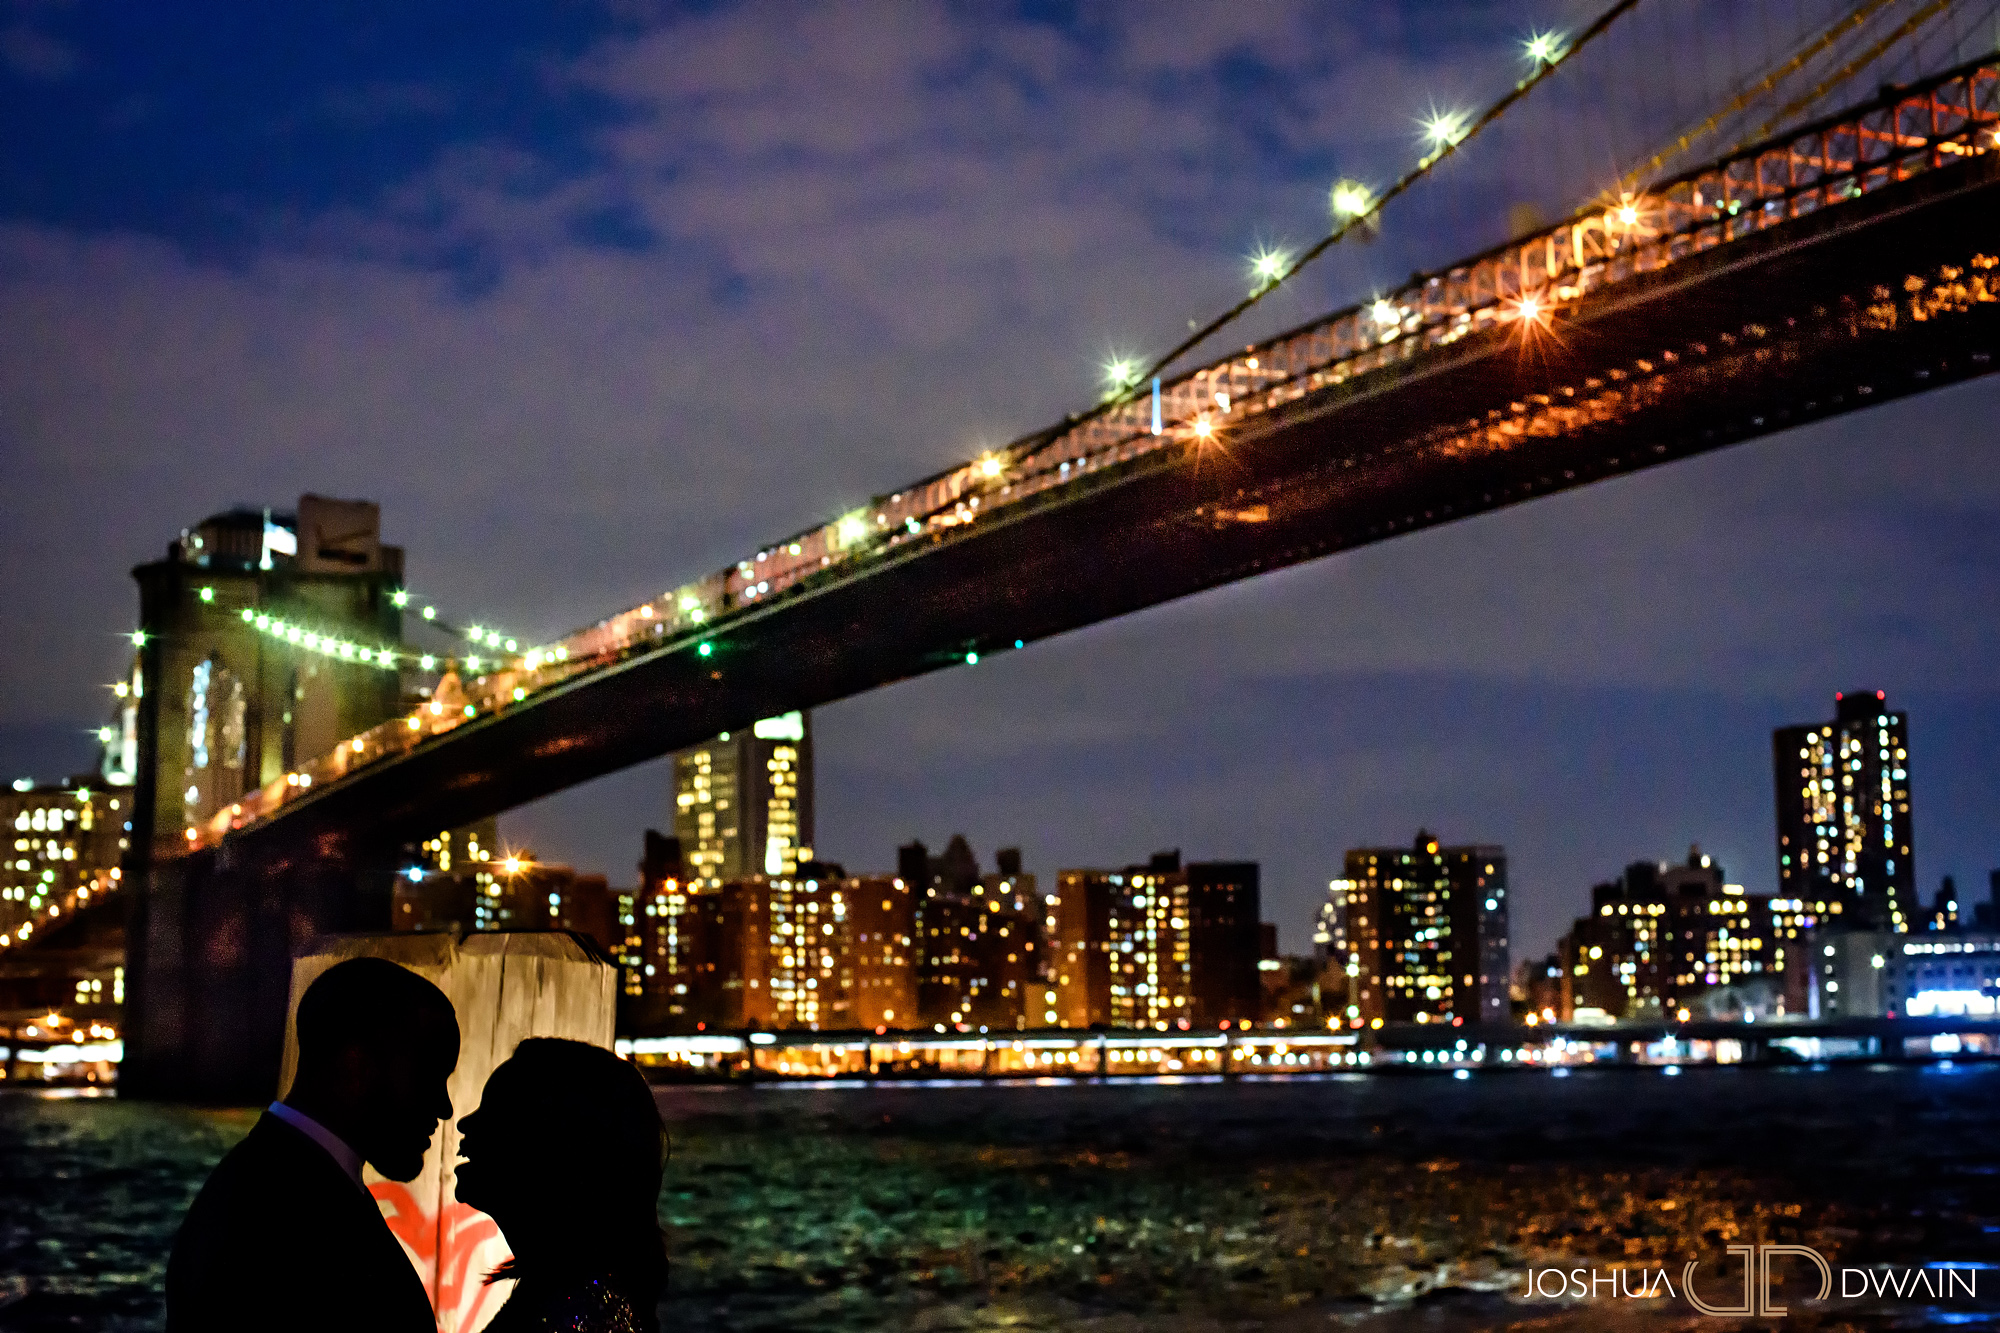 amber-jared-008-dumbo-brooklyn-engagement-photos-joshua-dwain